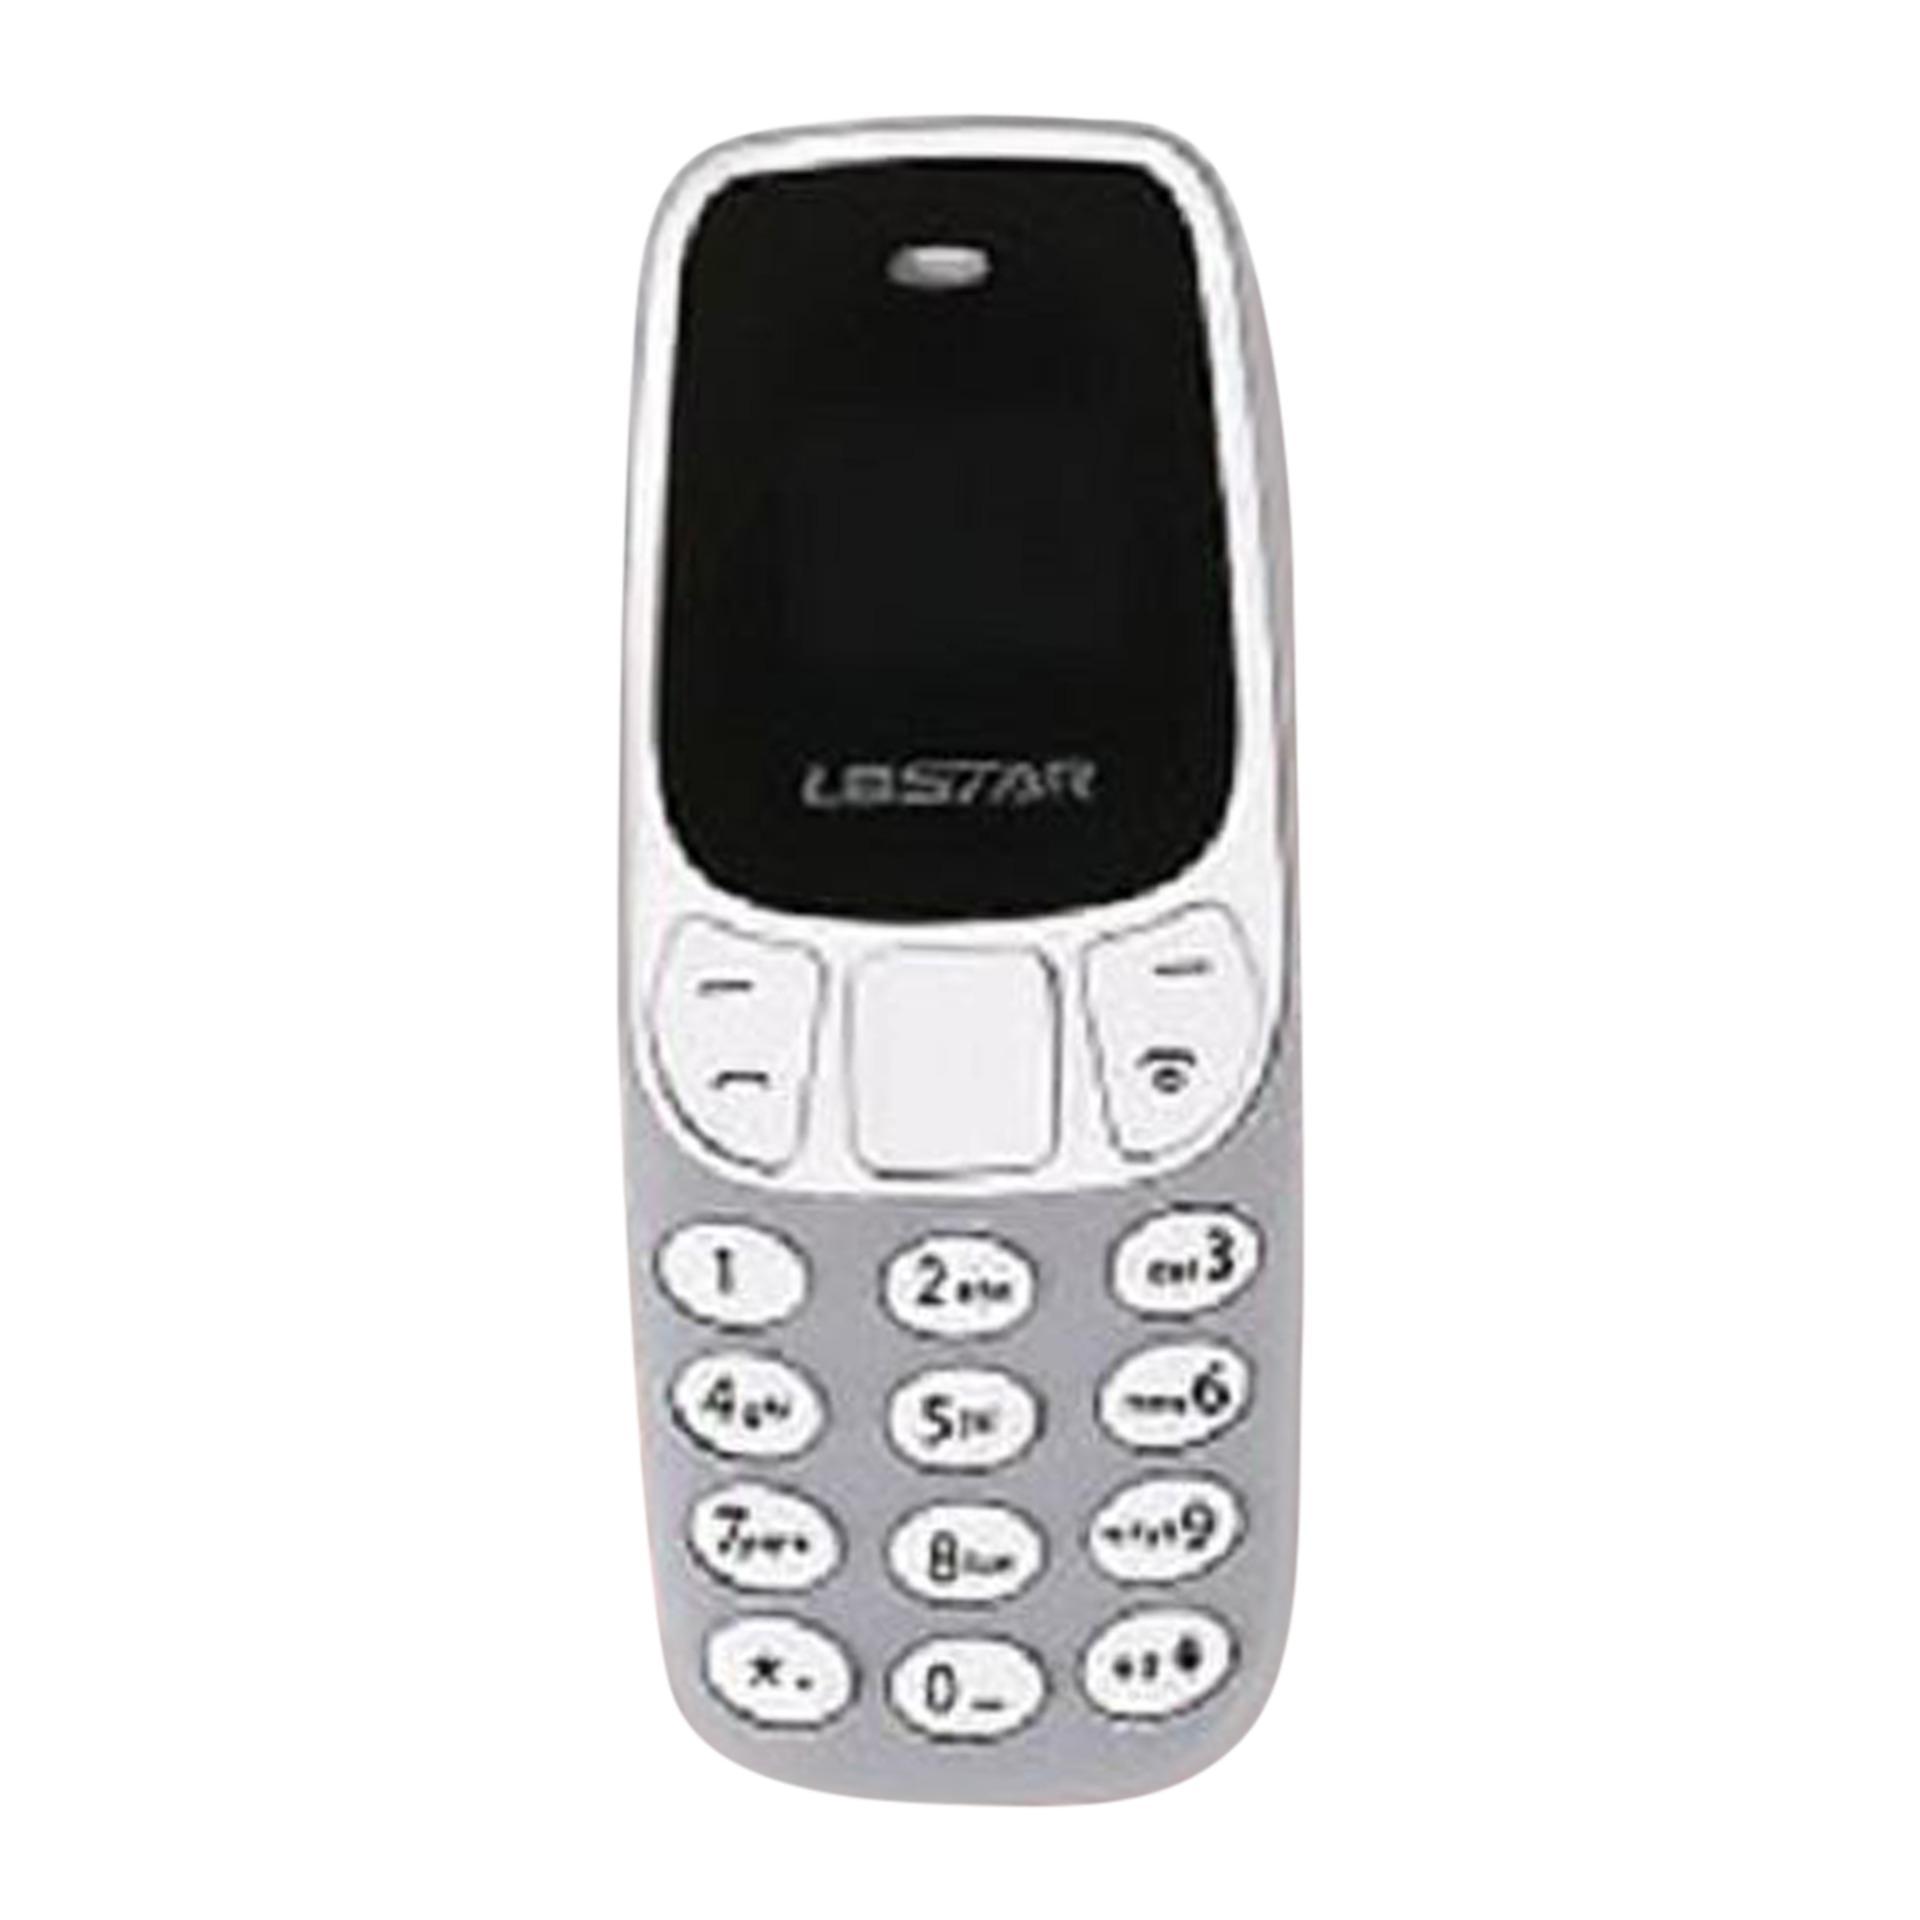 Mini phone BM10 Dual Sim And Bluetooth phone in BD